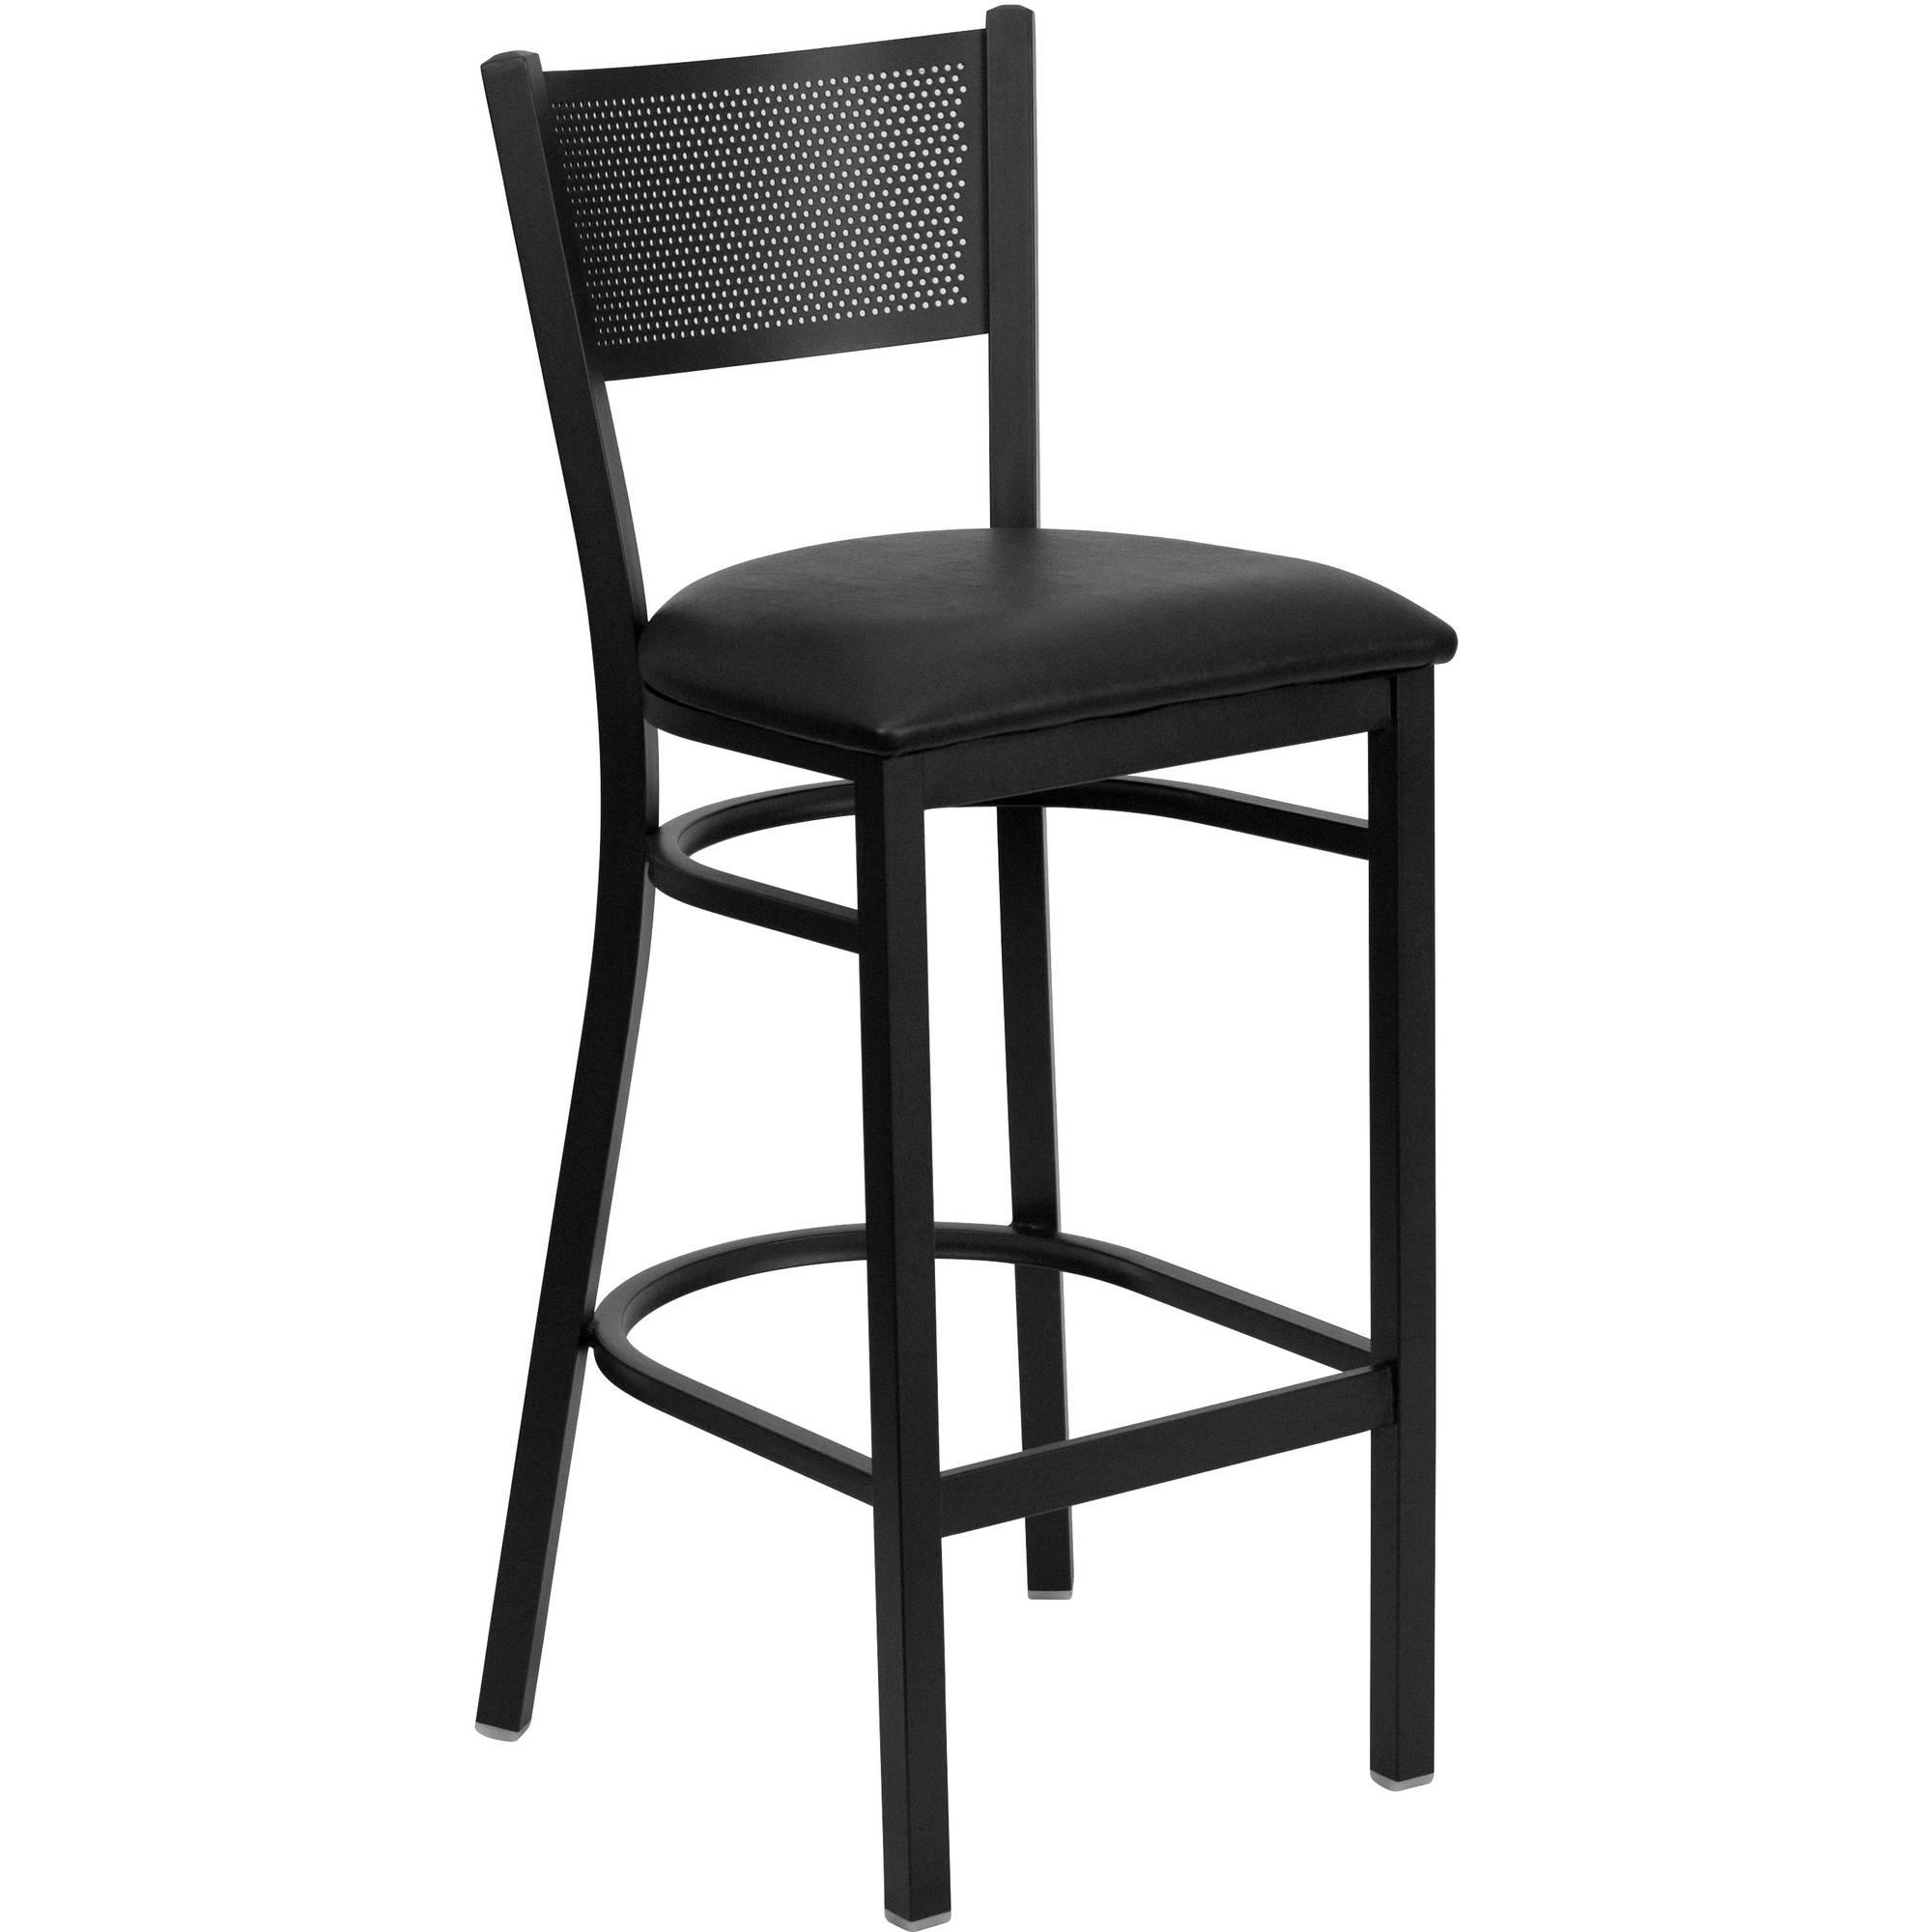 Flash Furniture HERCULES Series Black Grid Back Metal Restaurant Barstool, Vinyl Seat, Multiple Colors